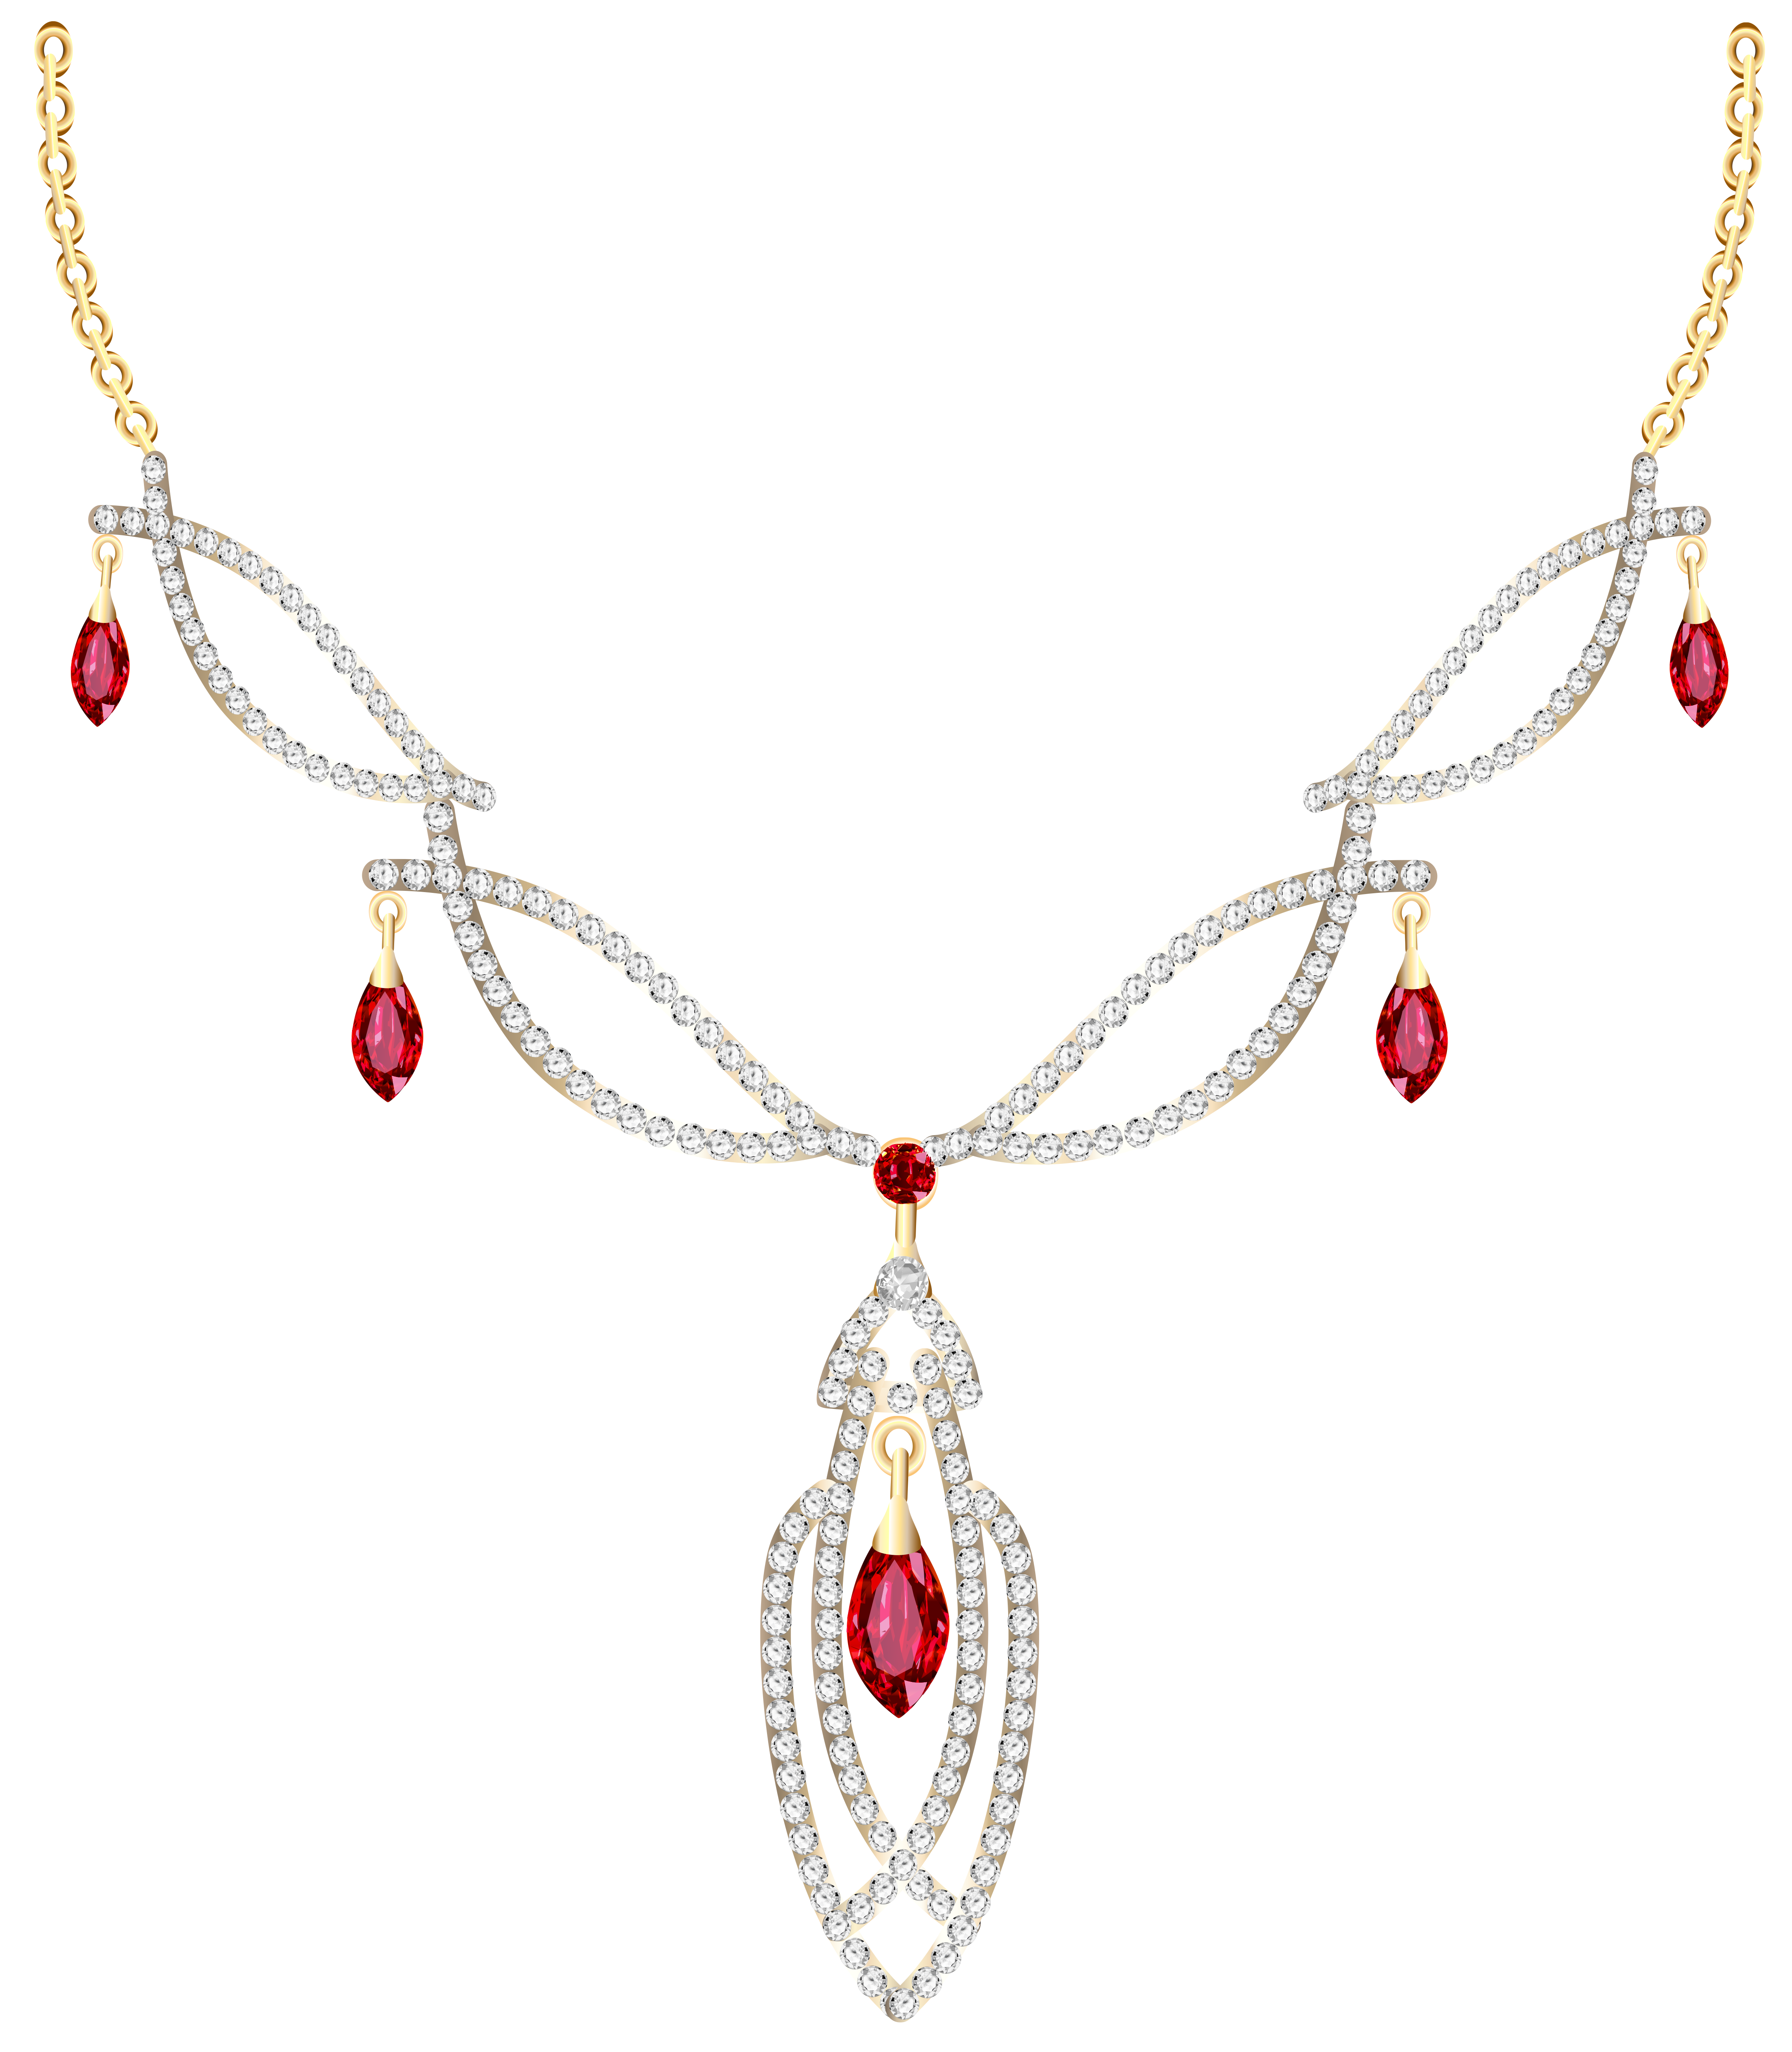 necklace clipart.